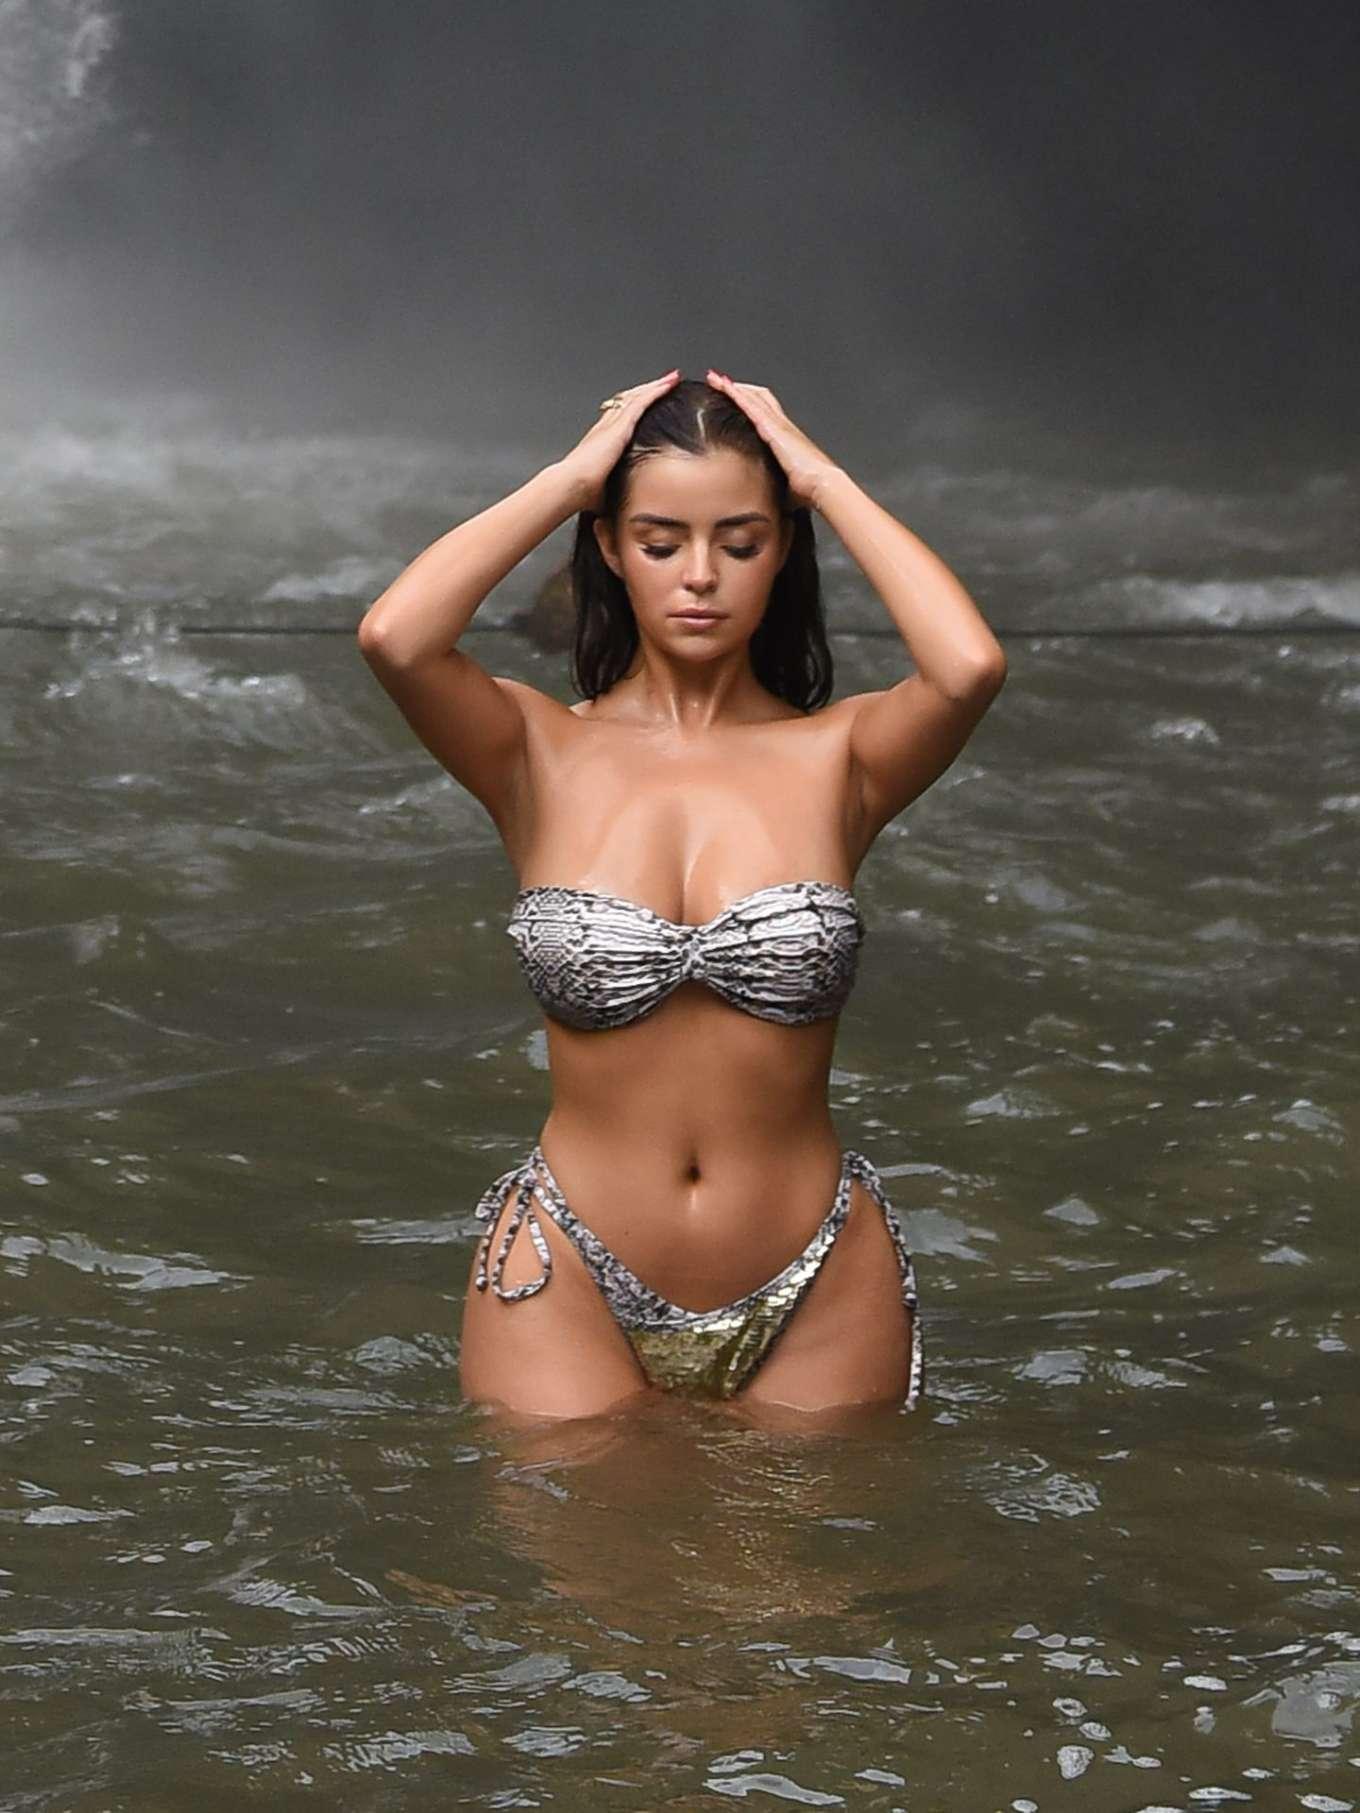 Demi Rose Mawby - Photoshoot In Bali